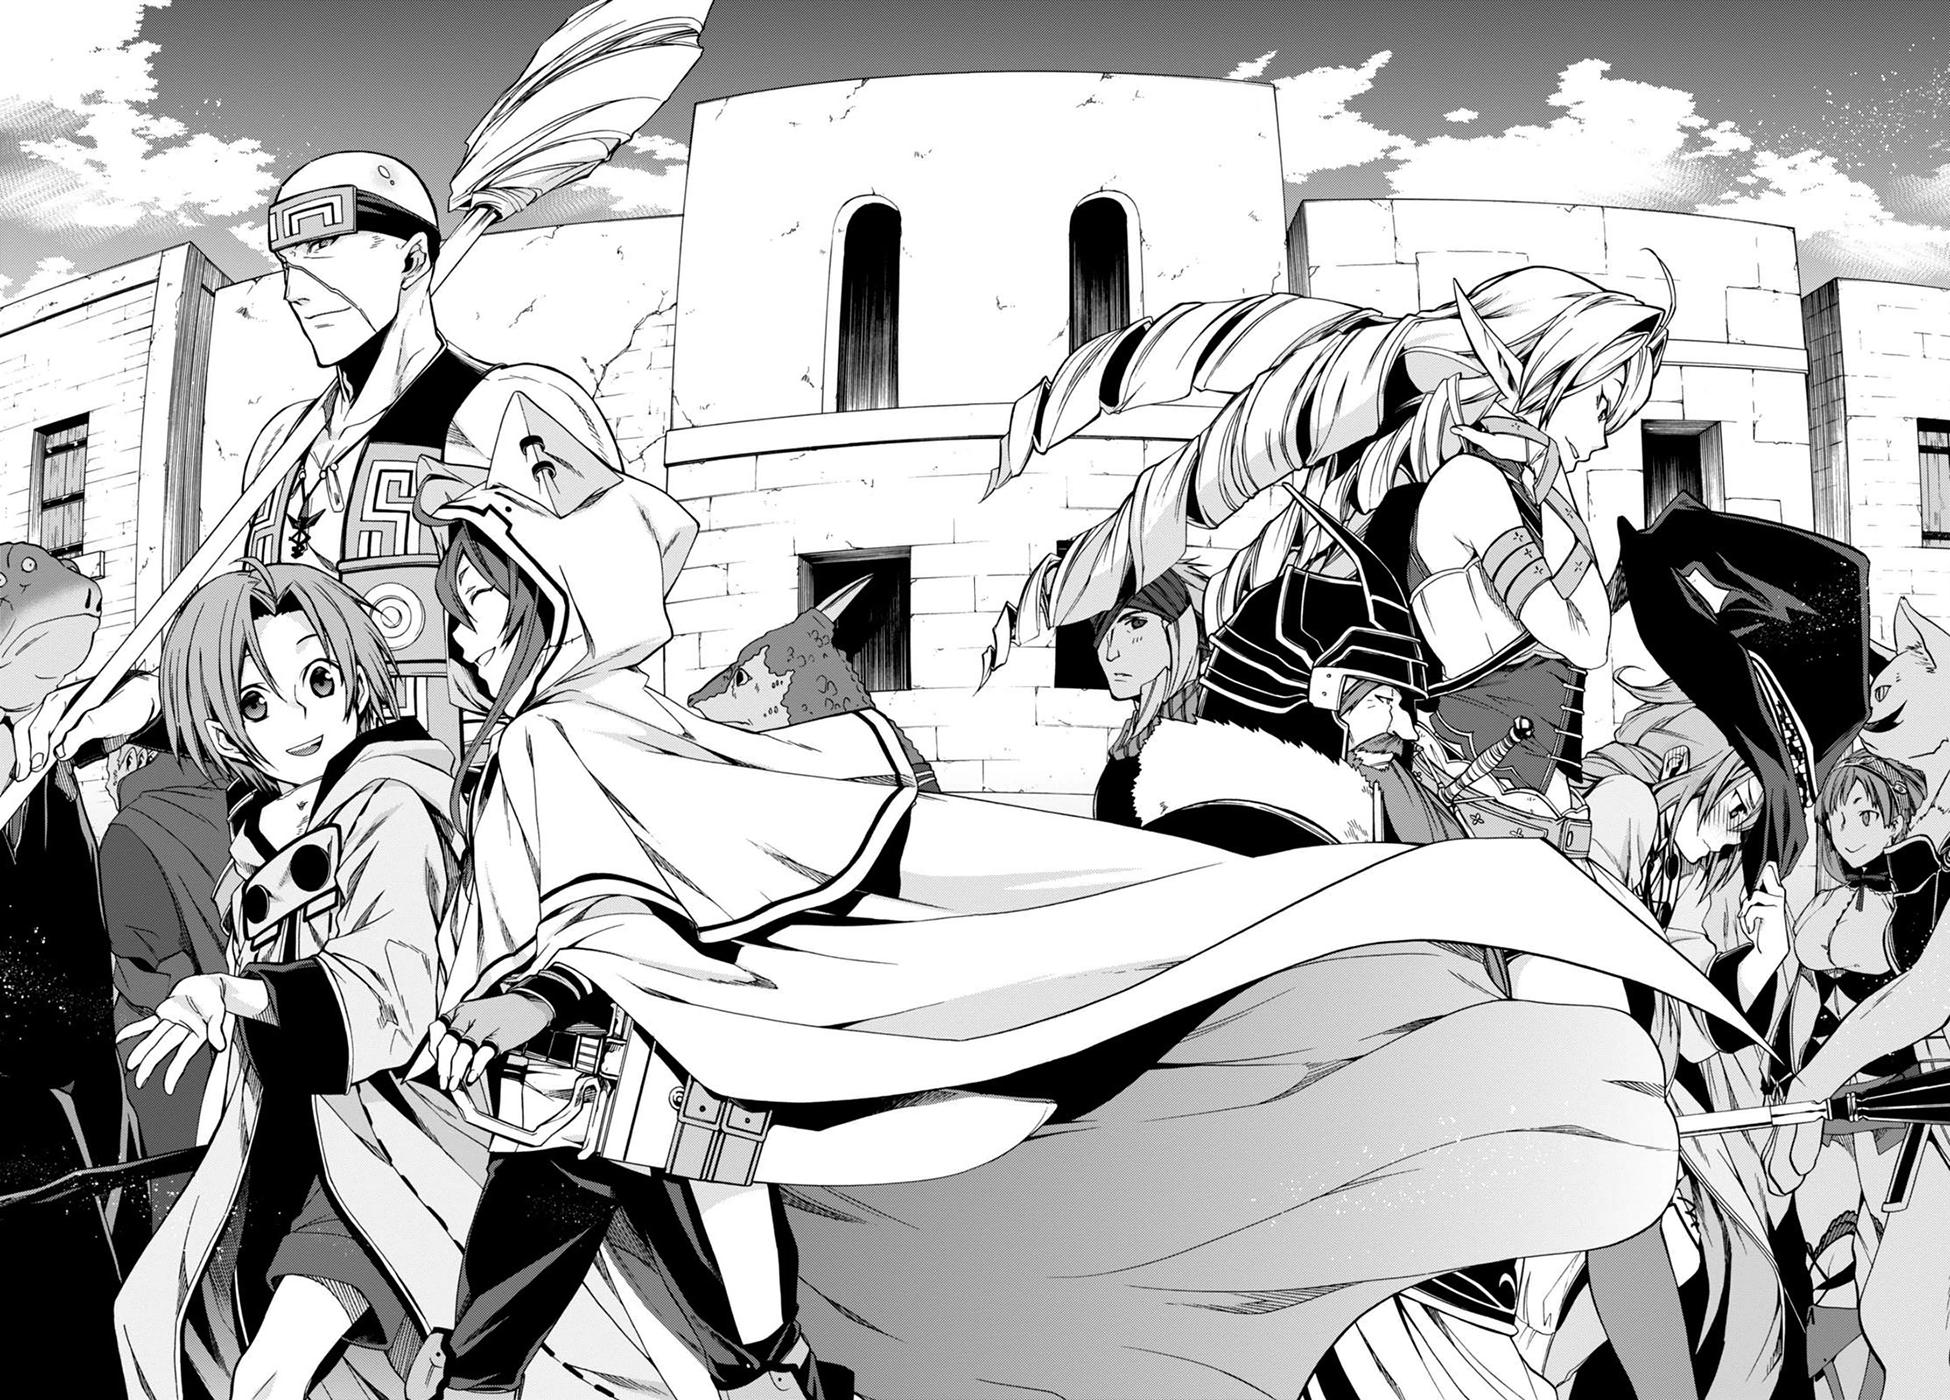 Read manga Mushoku Tensei Isekai Ittara Honki Dasu Vol